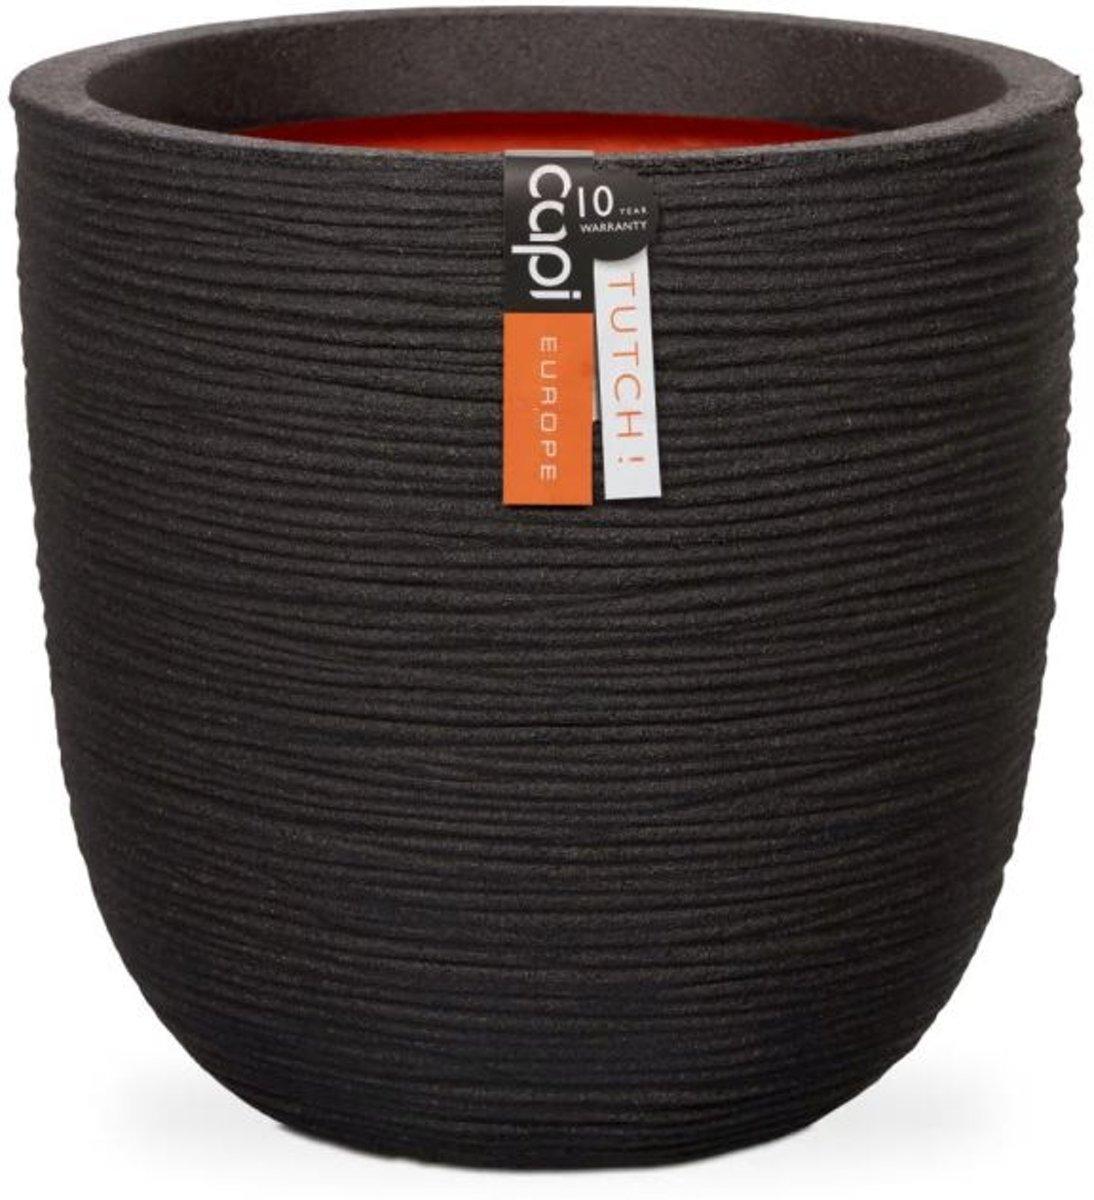 Capi Nature pot bol rib NL 54x52 - zwart